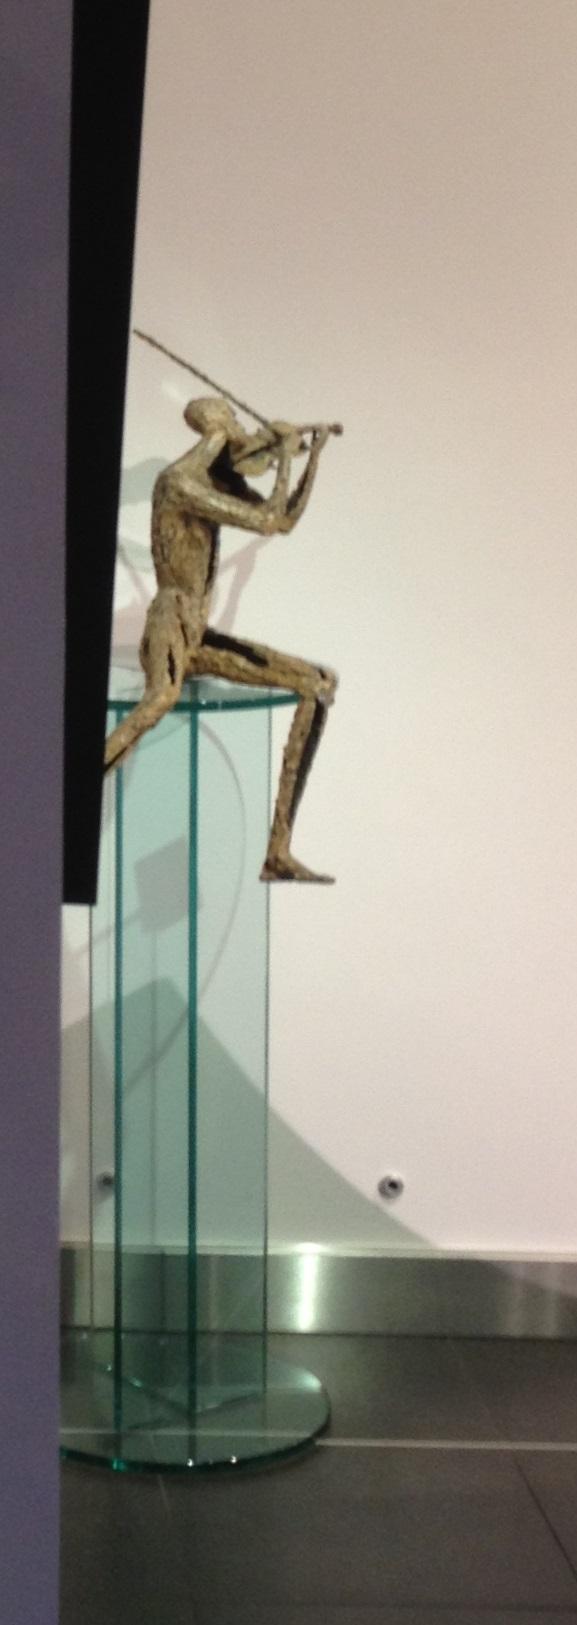 Van den Abeele - sculpture - violon - © Casart